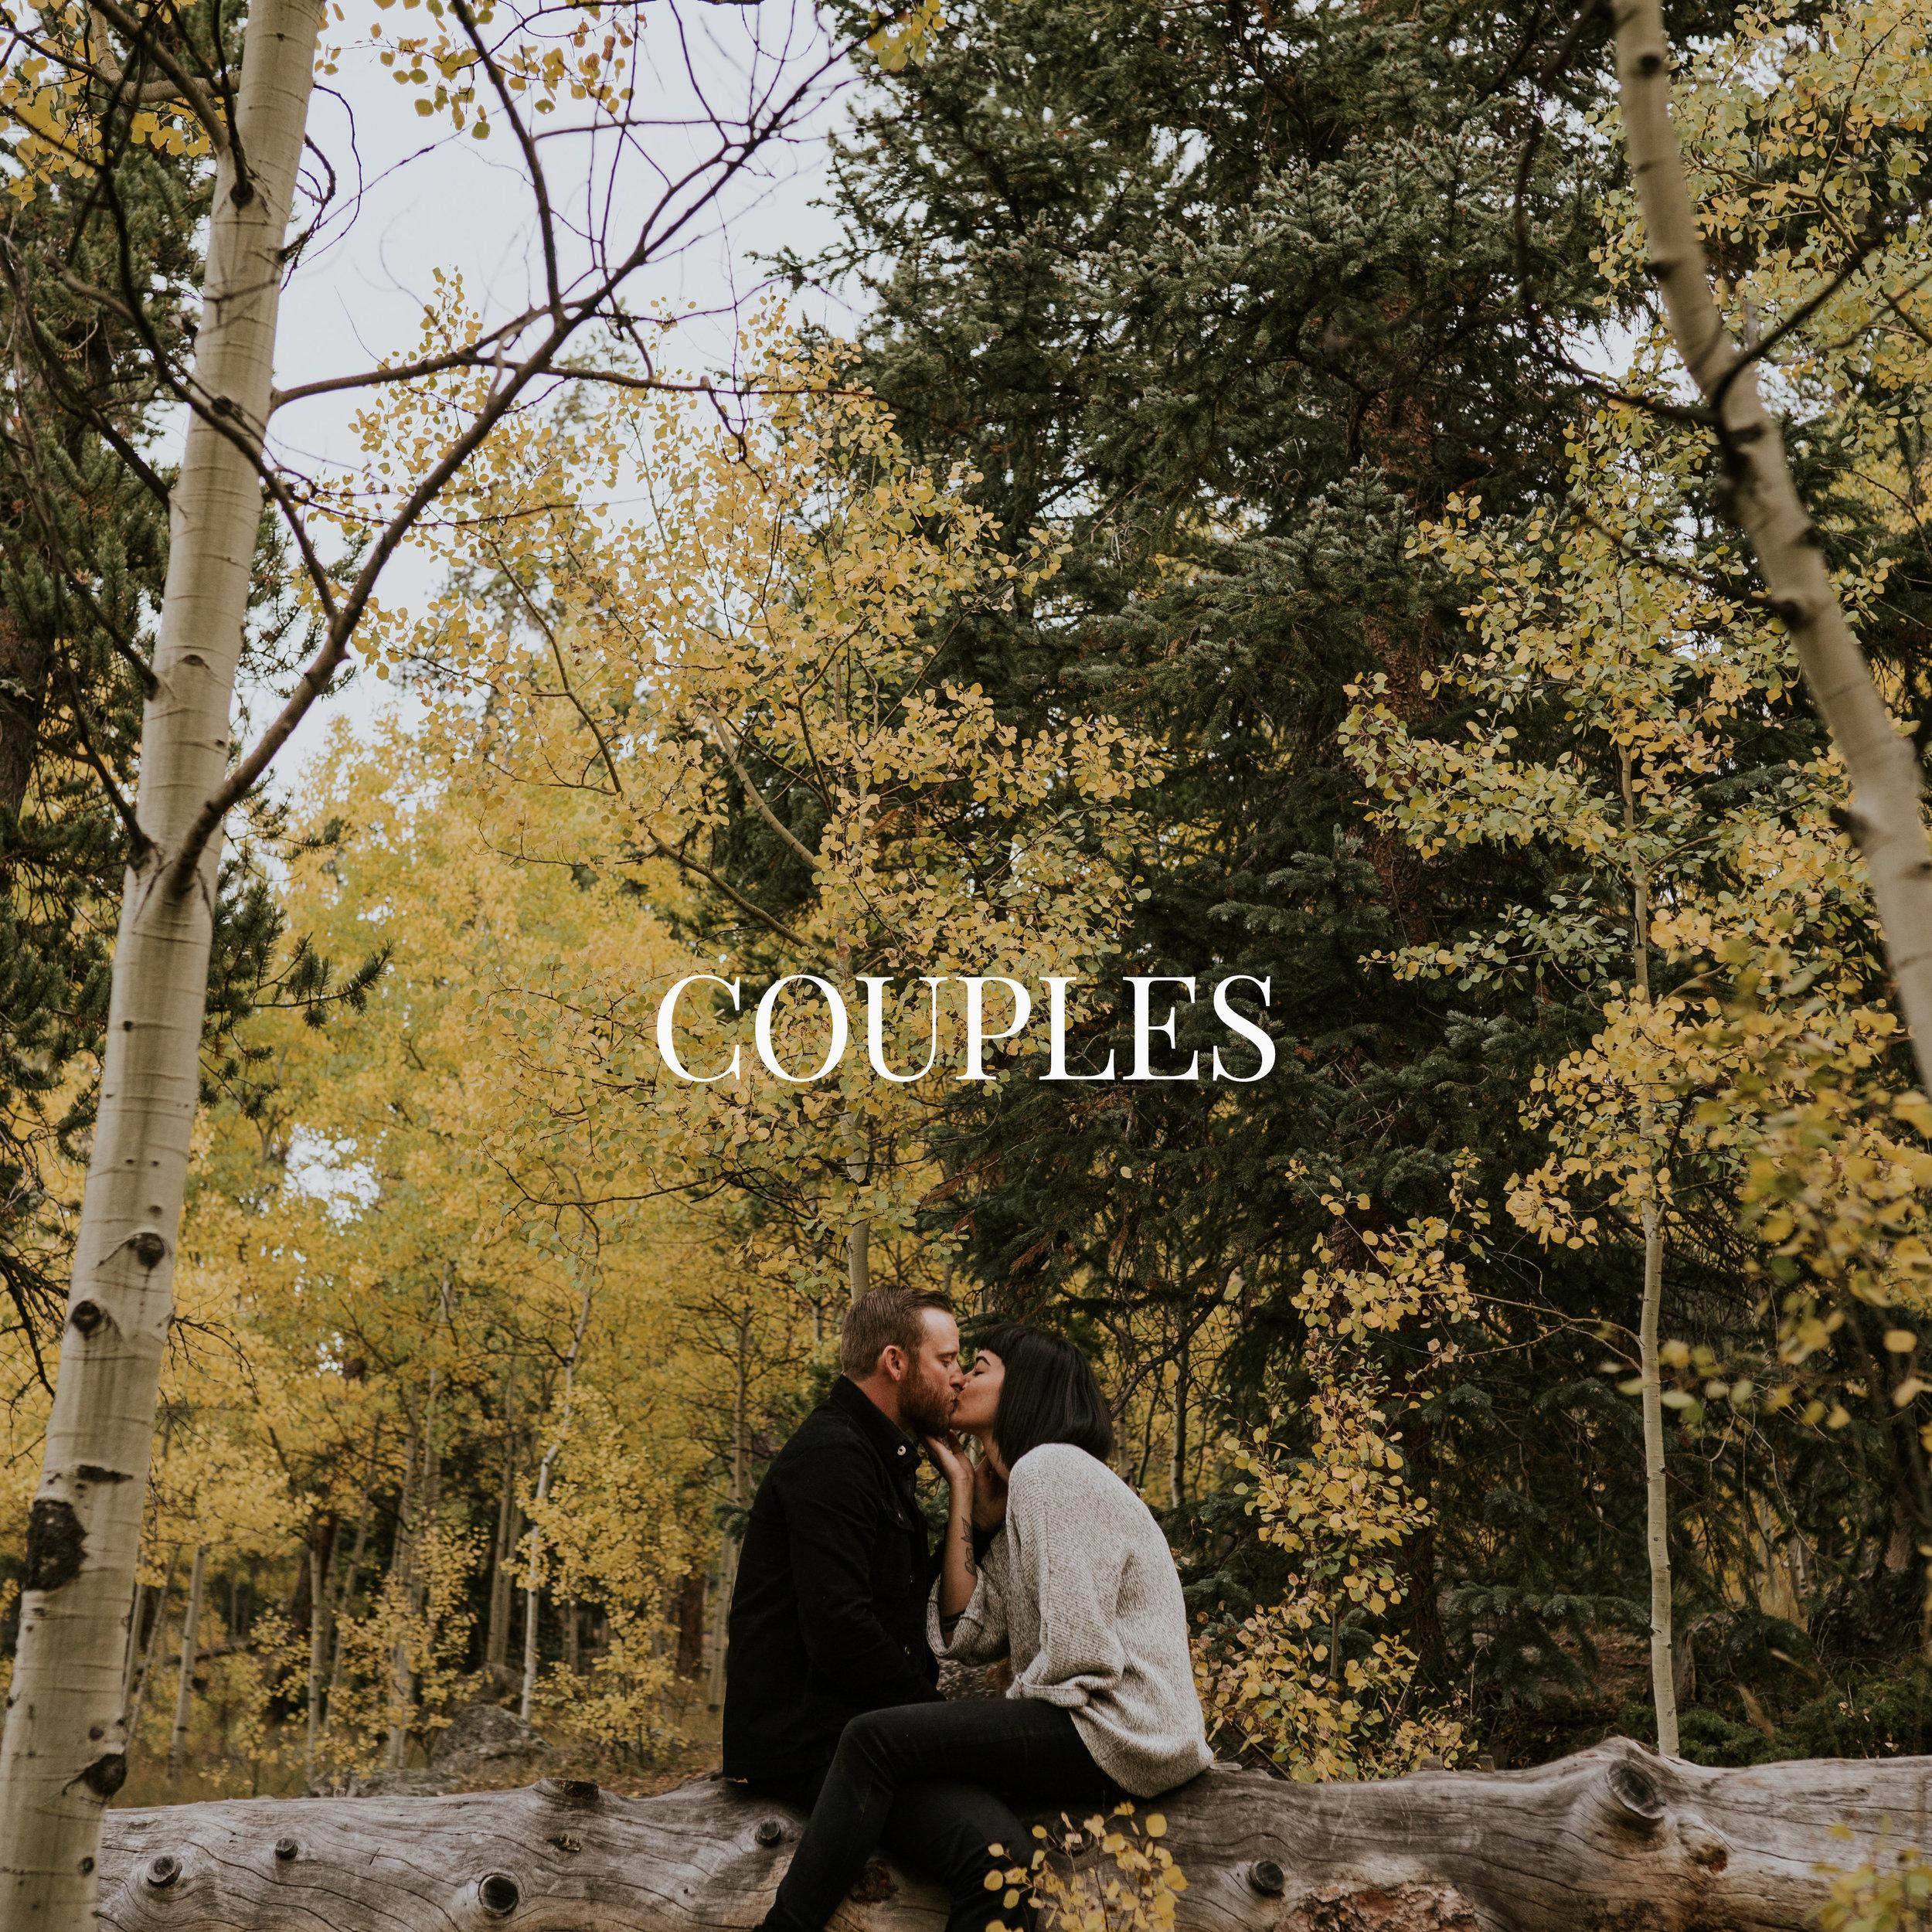 jake-sady-couple-kissing-on-tree-stump-colorado-raelyn-ramey-photography.jpg